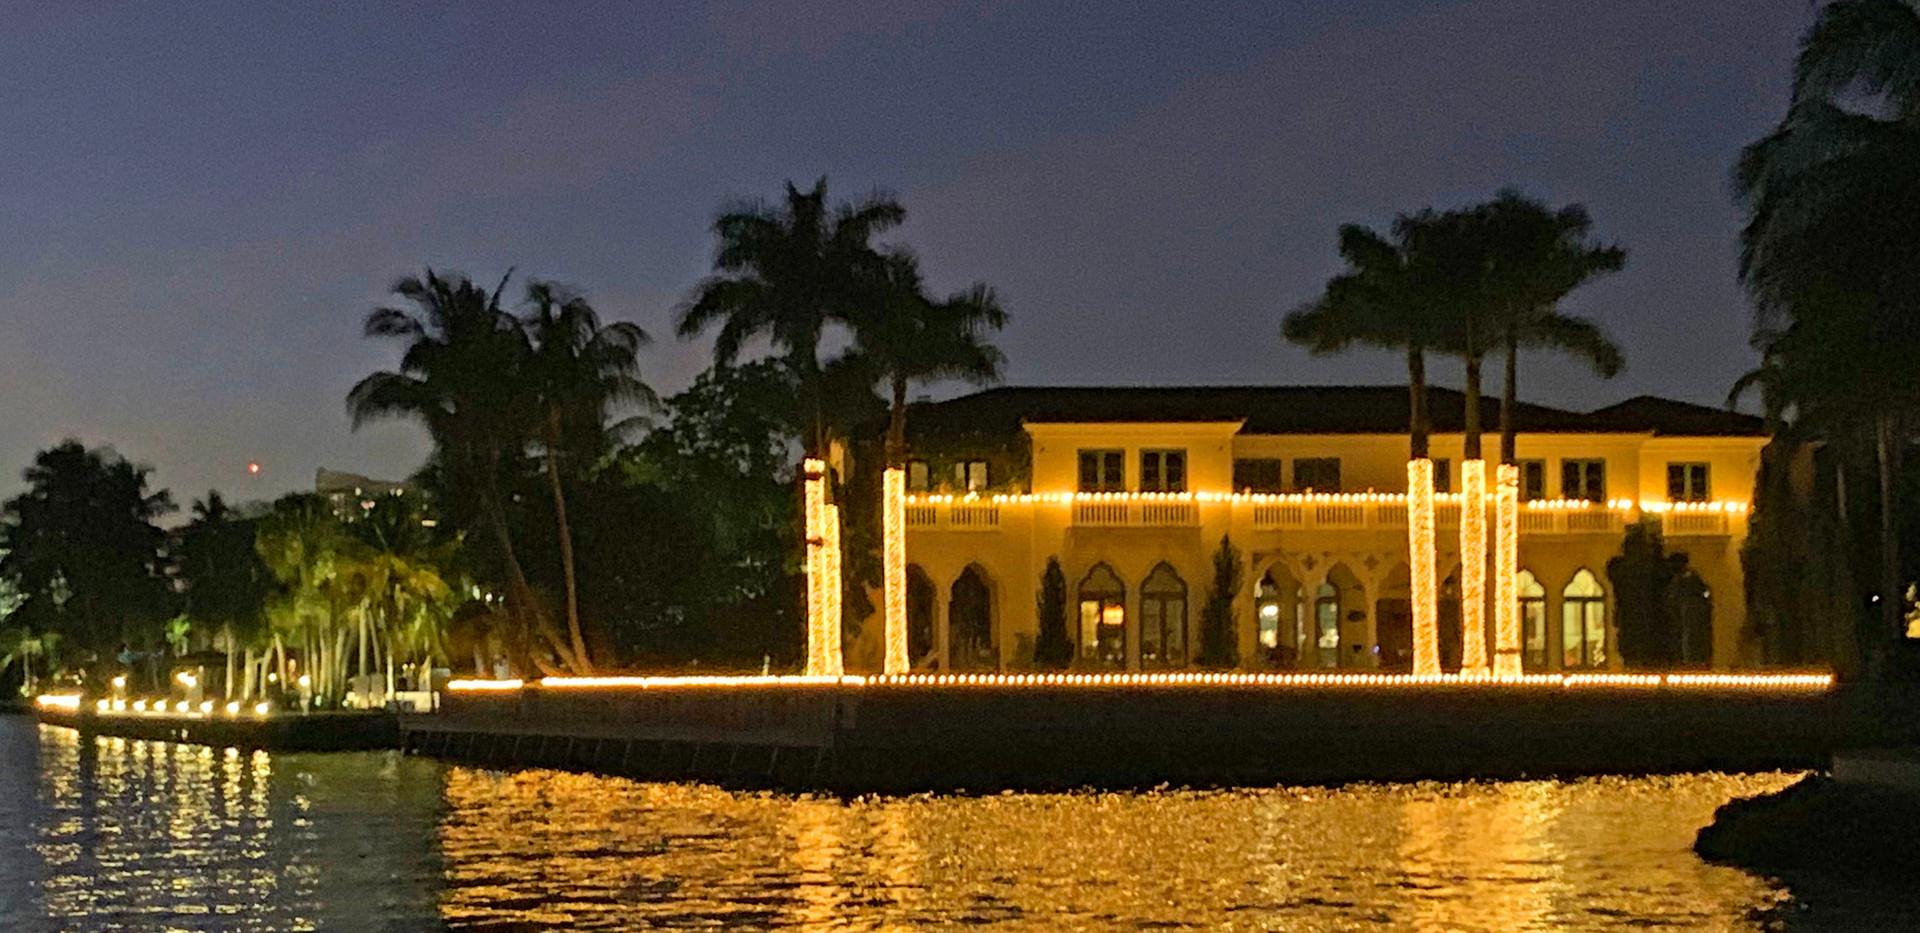 Near the Fort Lauderdale Sandbar